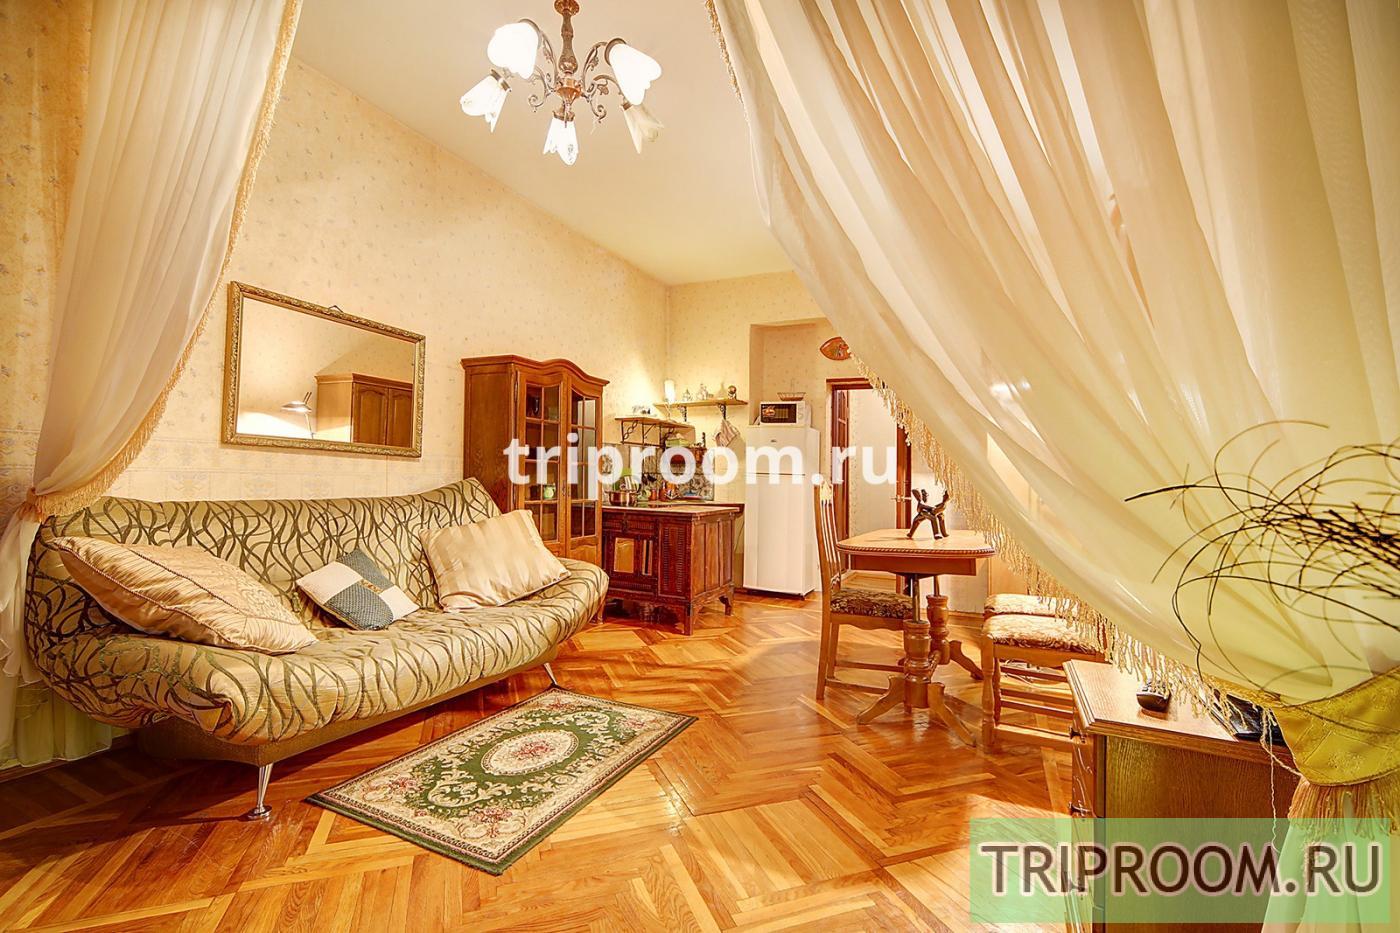 1-комнатная квартира посуточно (вариант № 15445), ул. Лиговский проспект, фото № 6